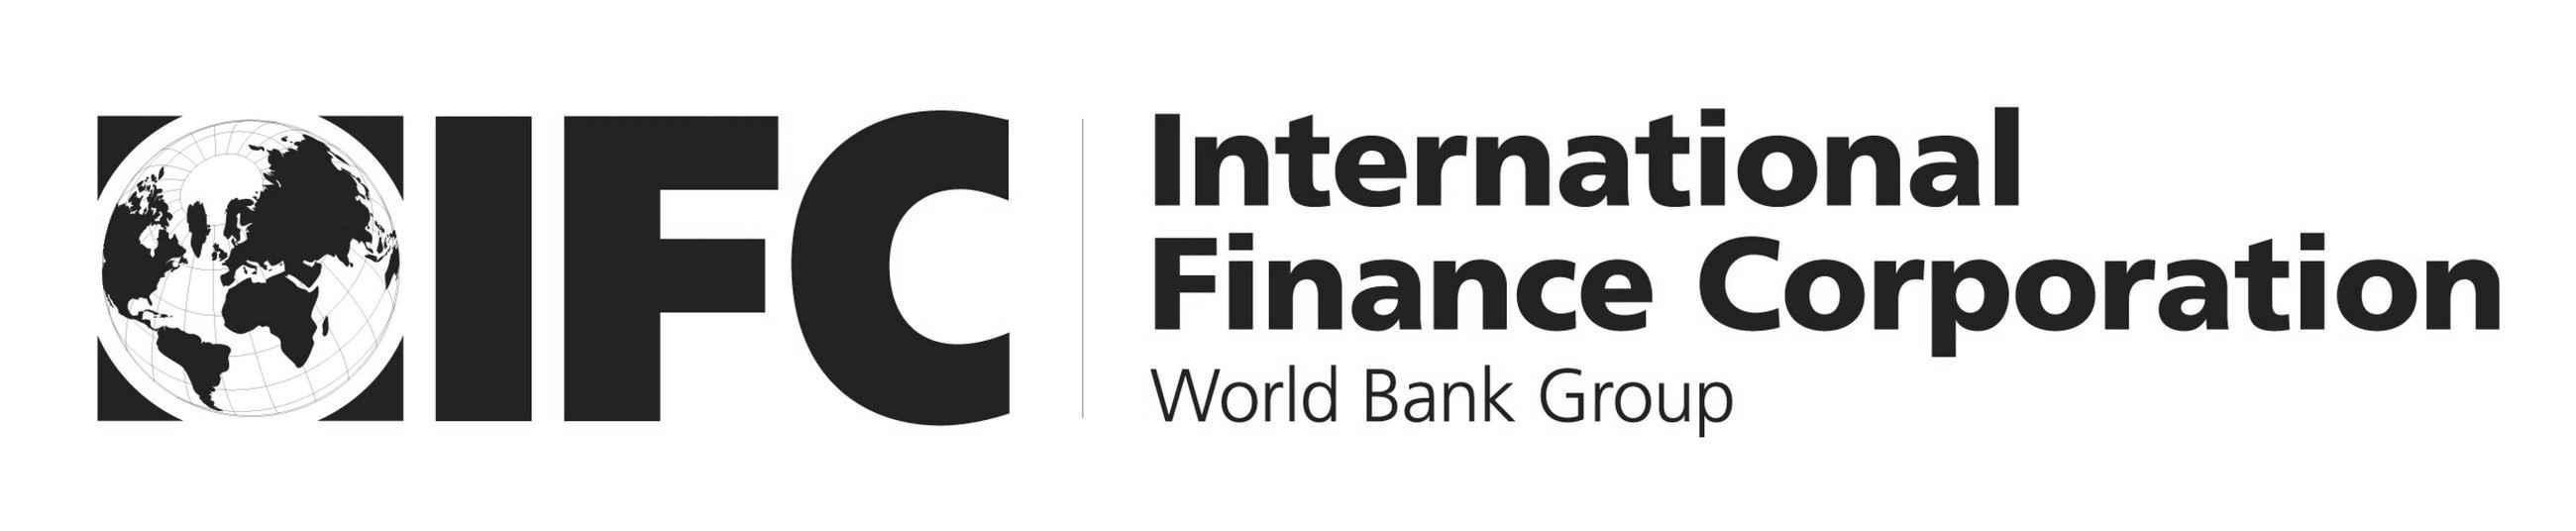 ifc international finance corporation logo